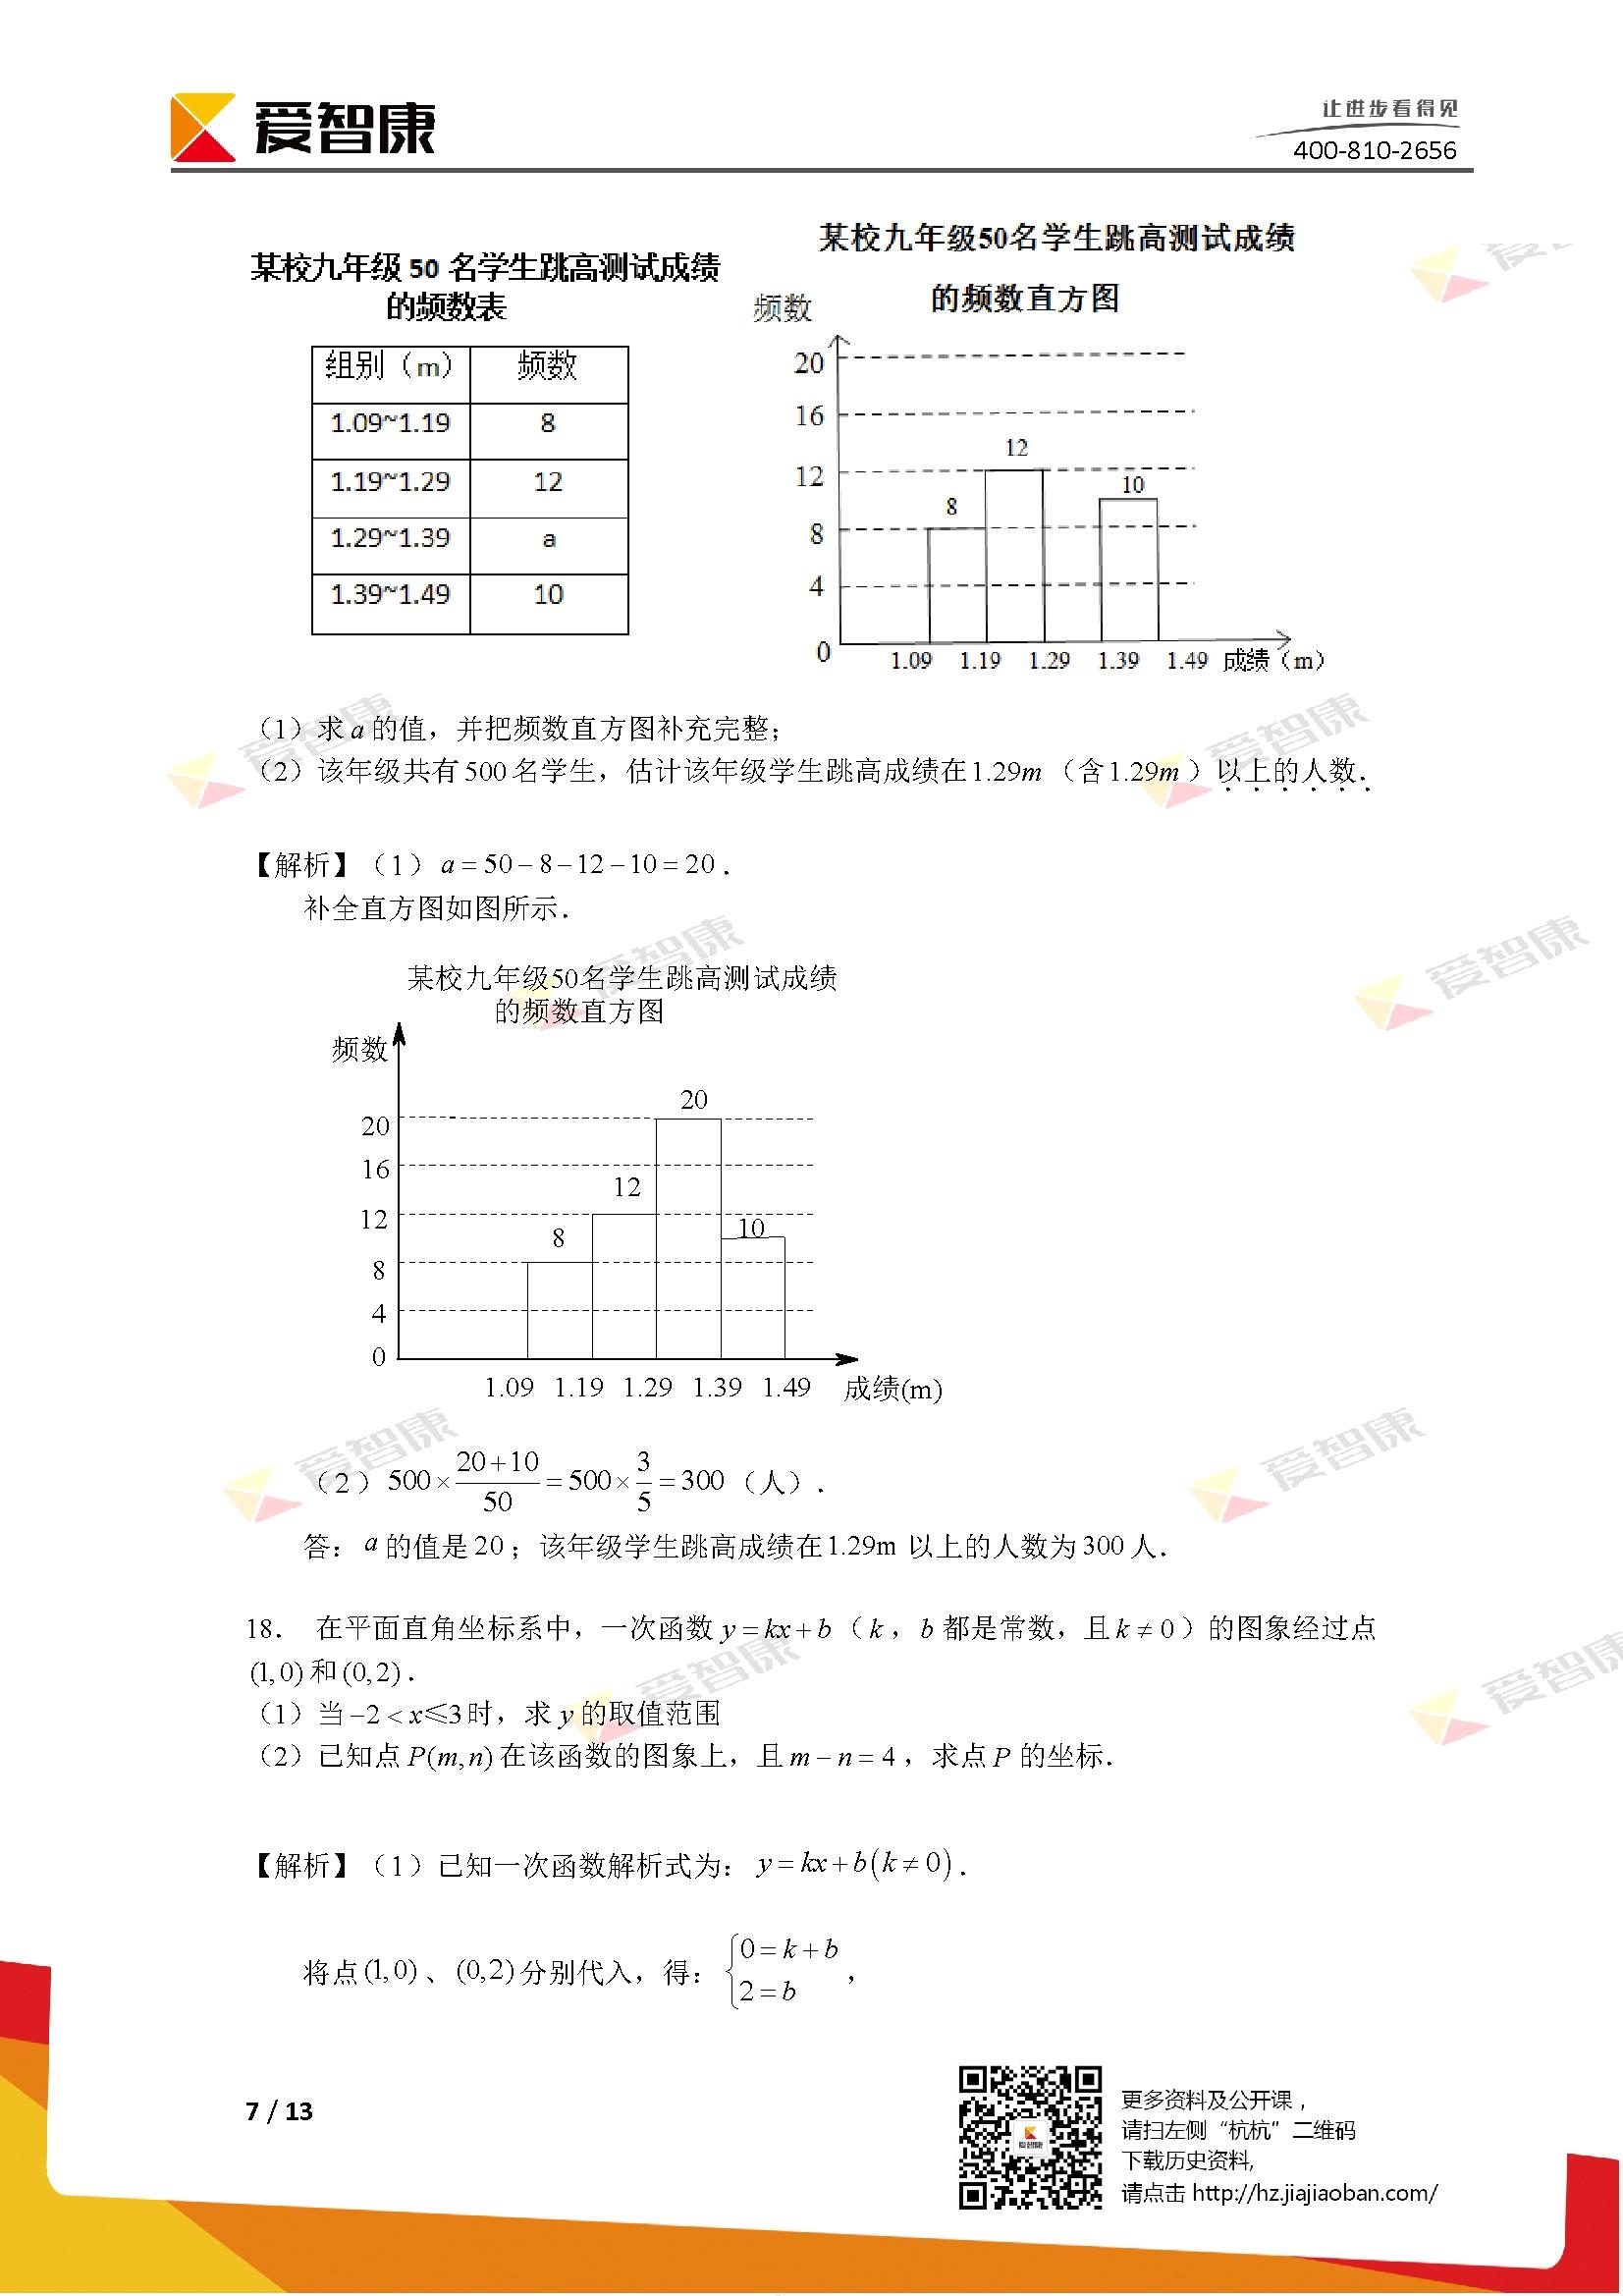 Microsoft Word - 2017年杭州市中考数学试卷解析27.jpg